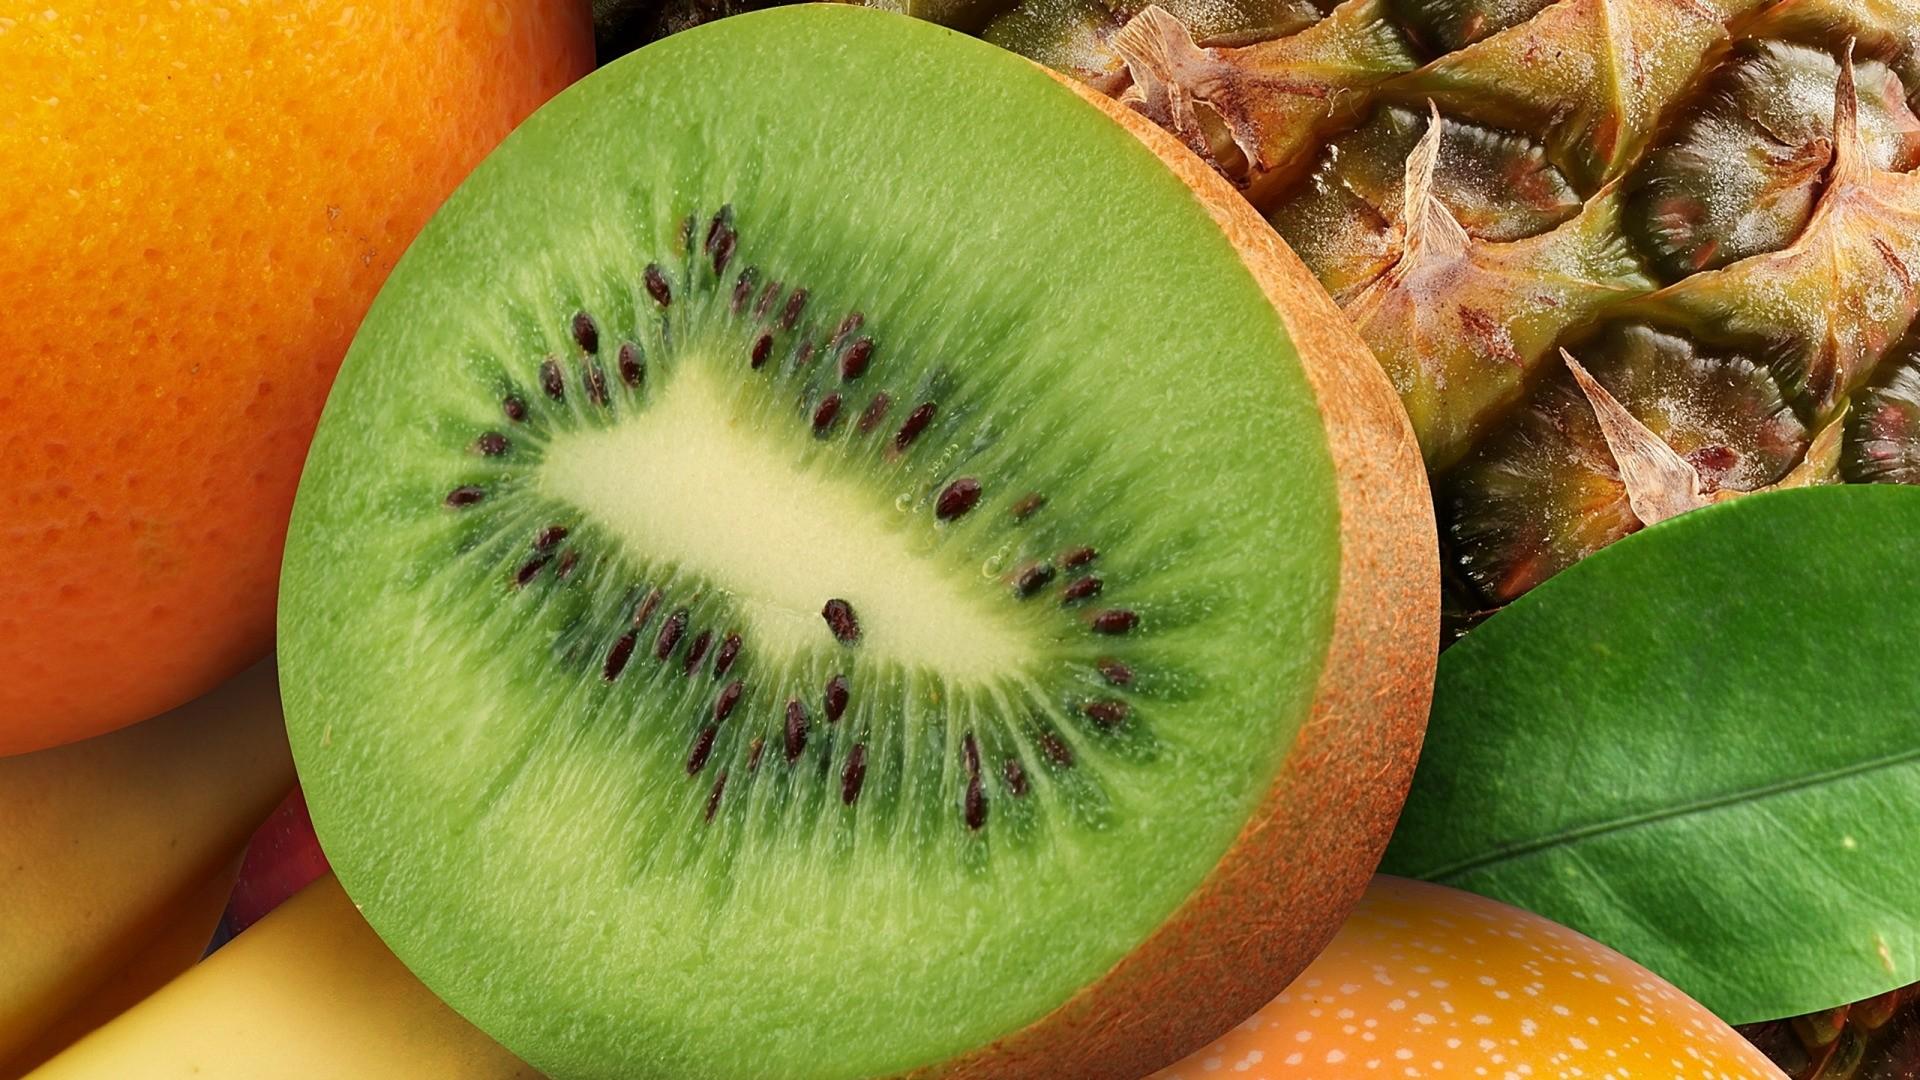 Fruit hd wallpaper download